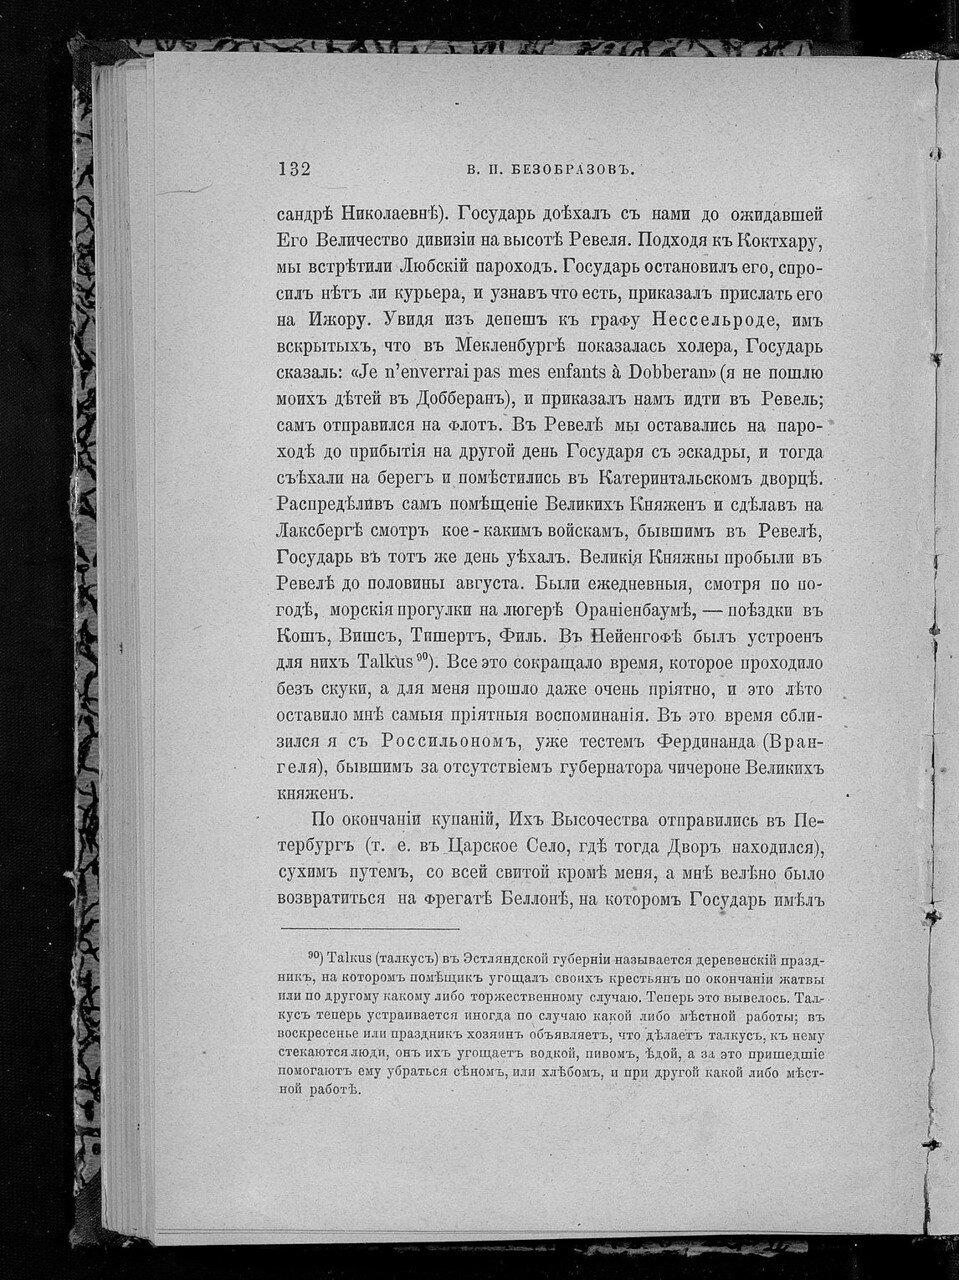 https://img-fotki.yandex.ru/get/879536/199368979.d6/0_21de23_22ecf68f_XXXL.jpg